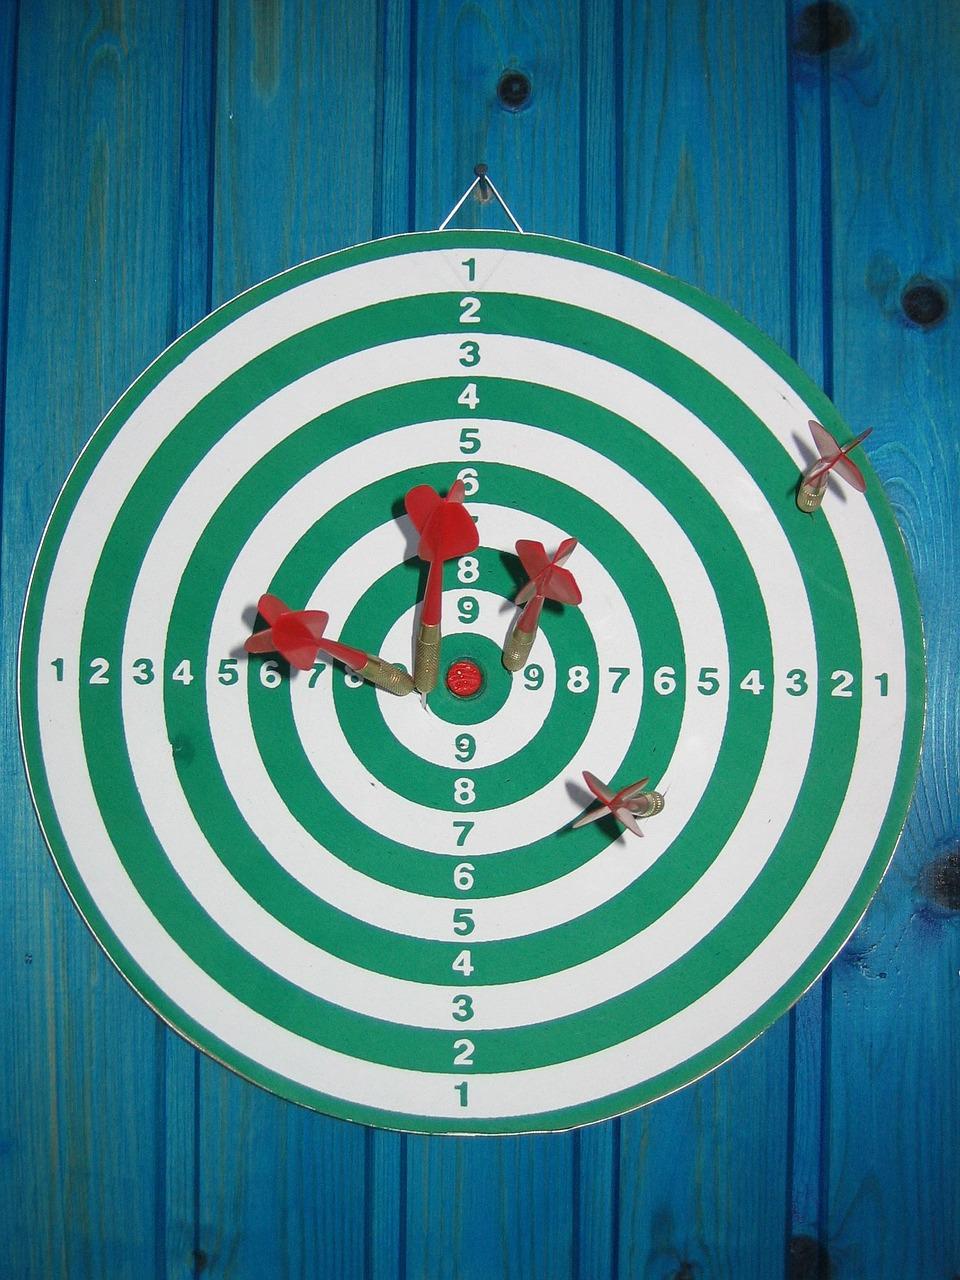 darts-857092_1280.jpg